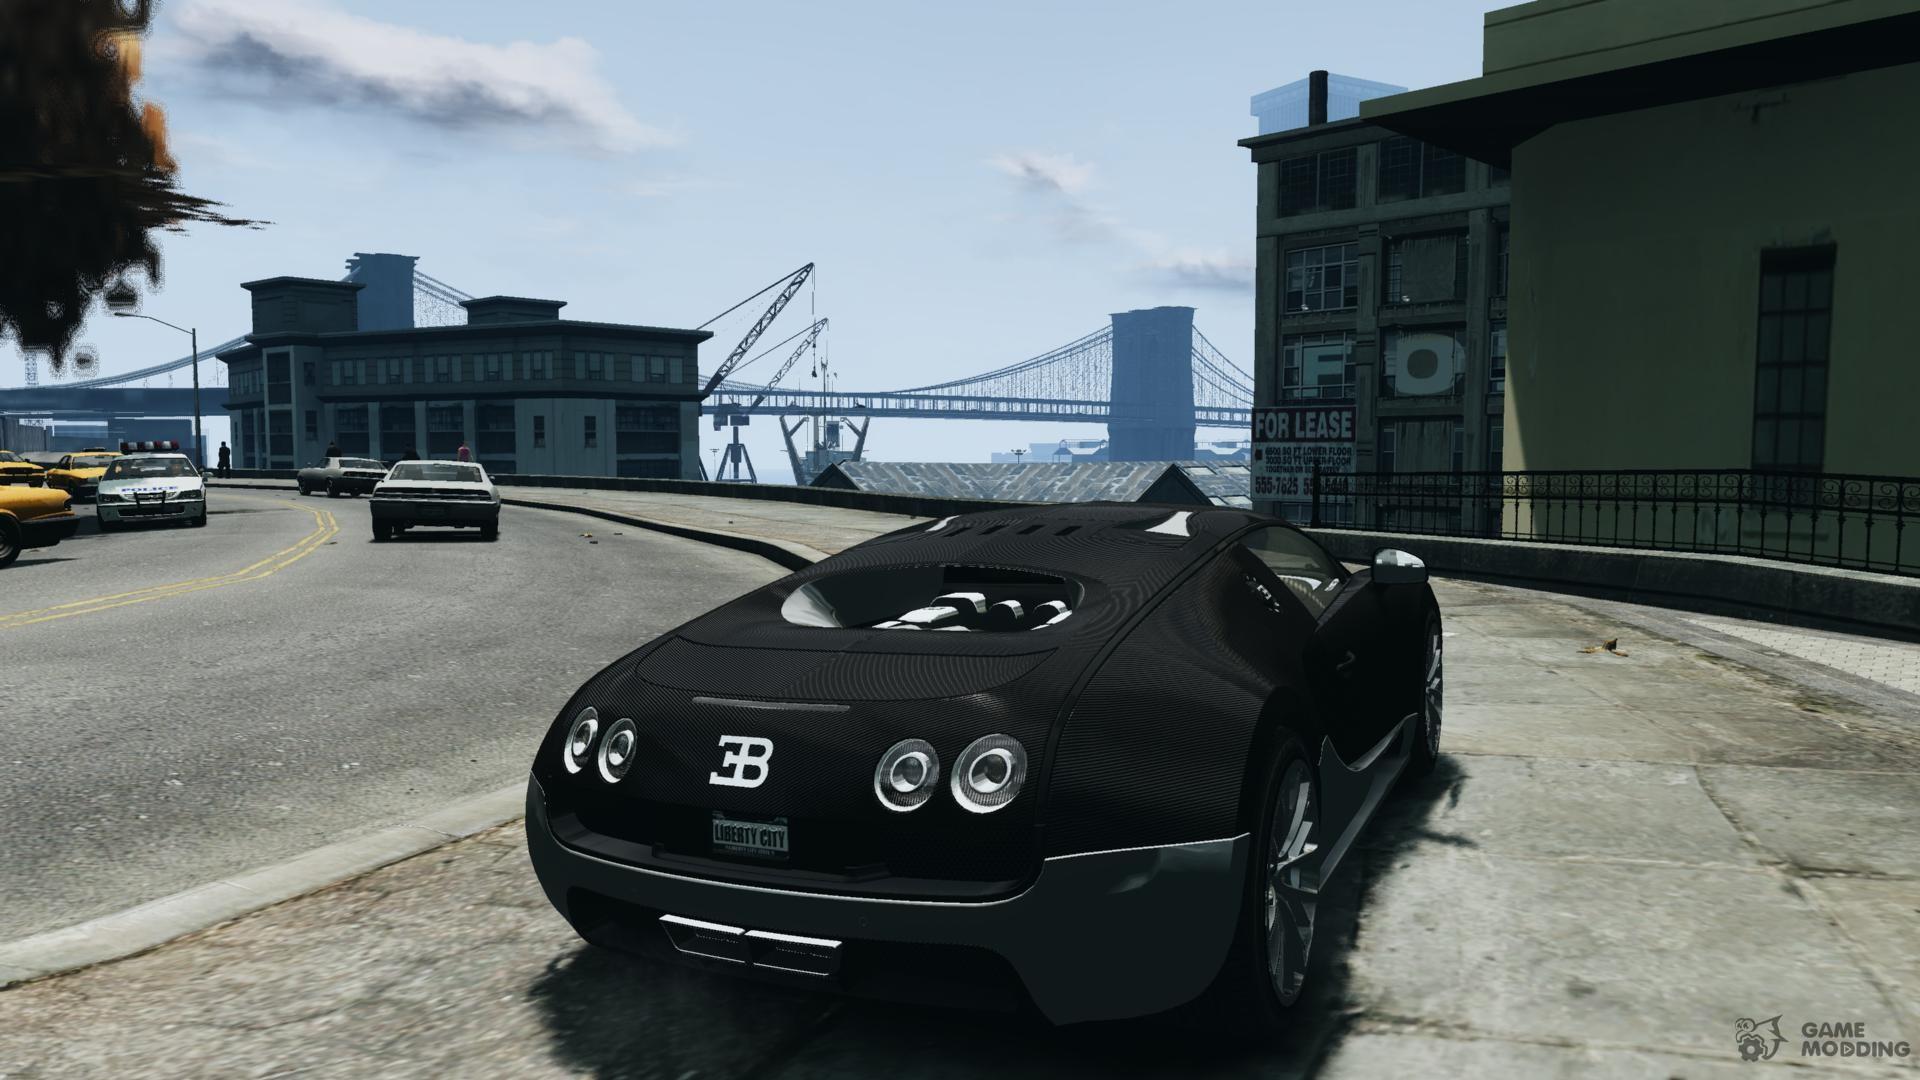 7de69a621fefe2d73a1bbee108f7135bbbd10de148e1b0bebeacc71f926622ff Wonderful Bugatti Veyron Xbox 360 Games Cars Trend